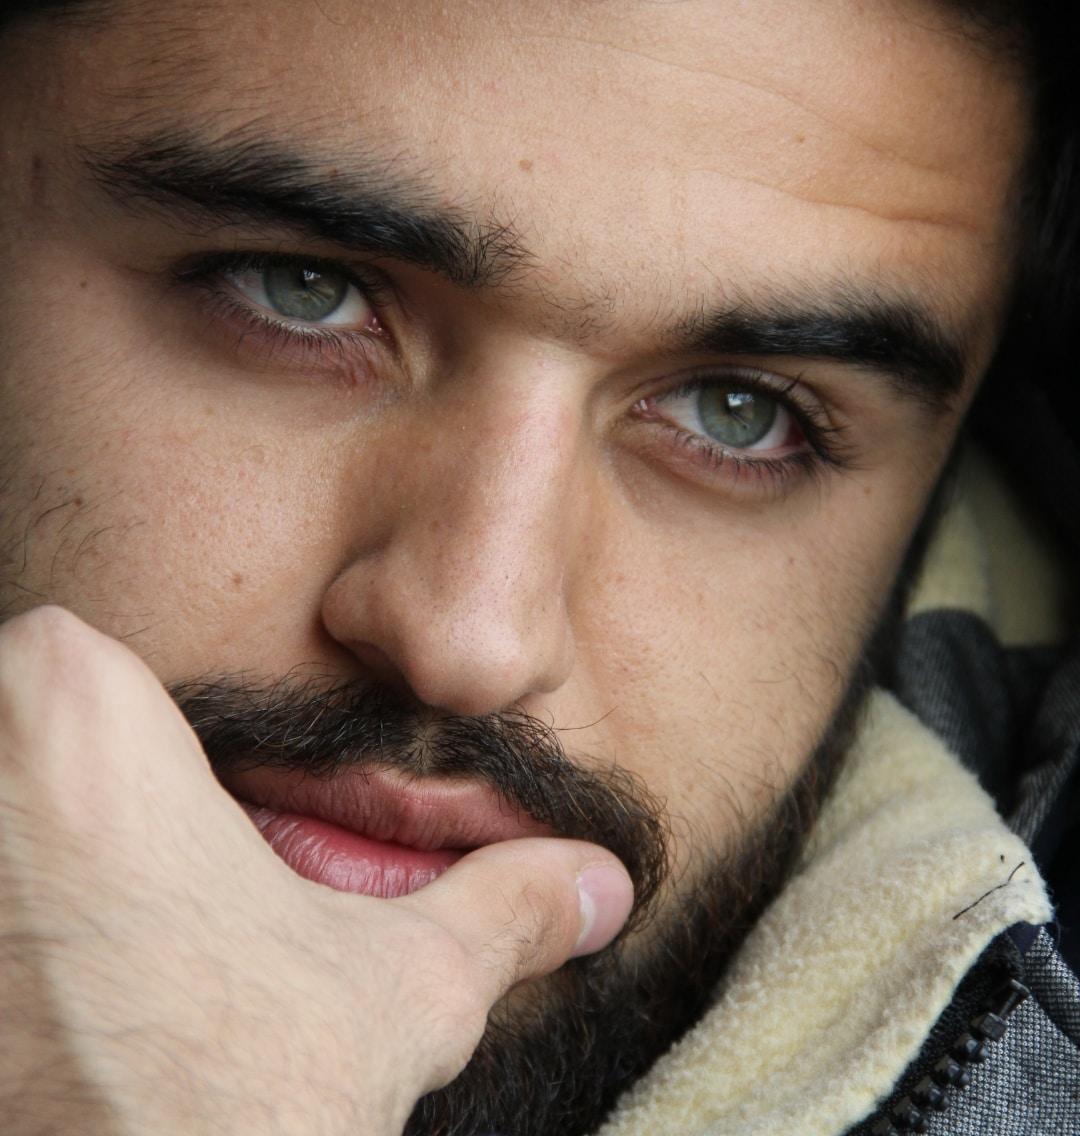 Go to Bahram Bayat's profile